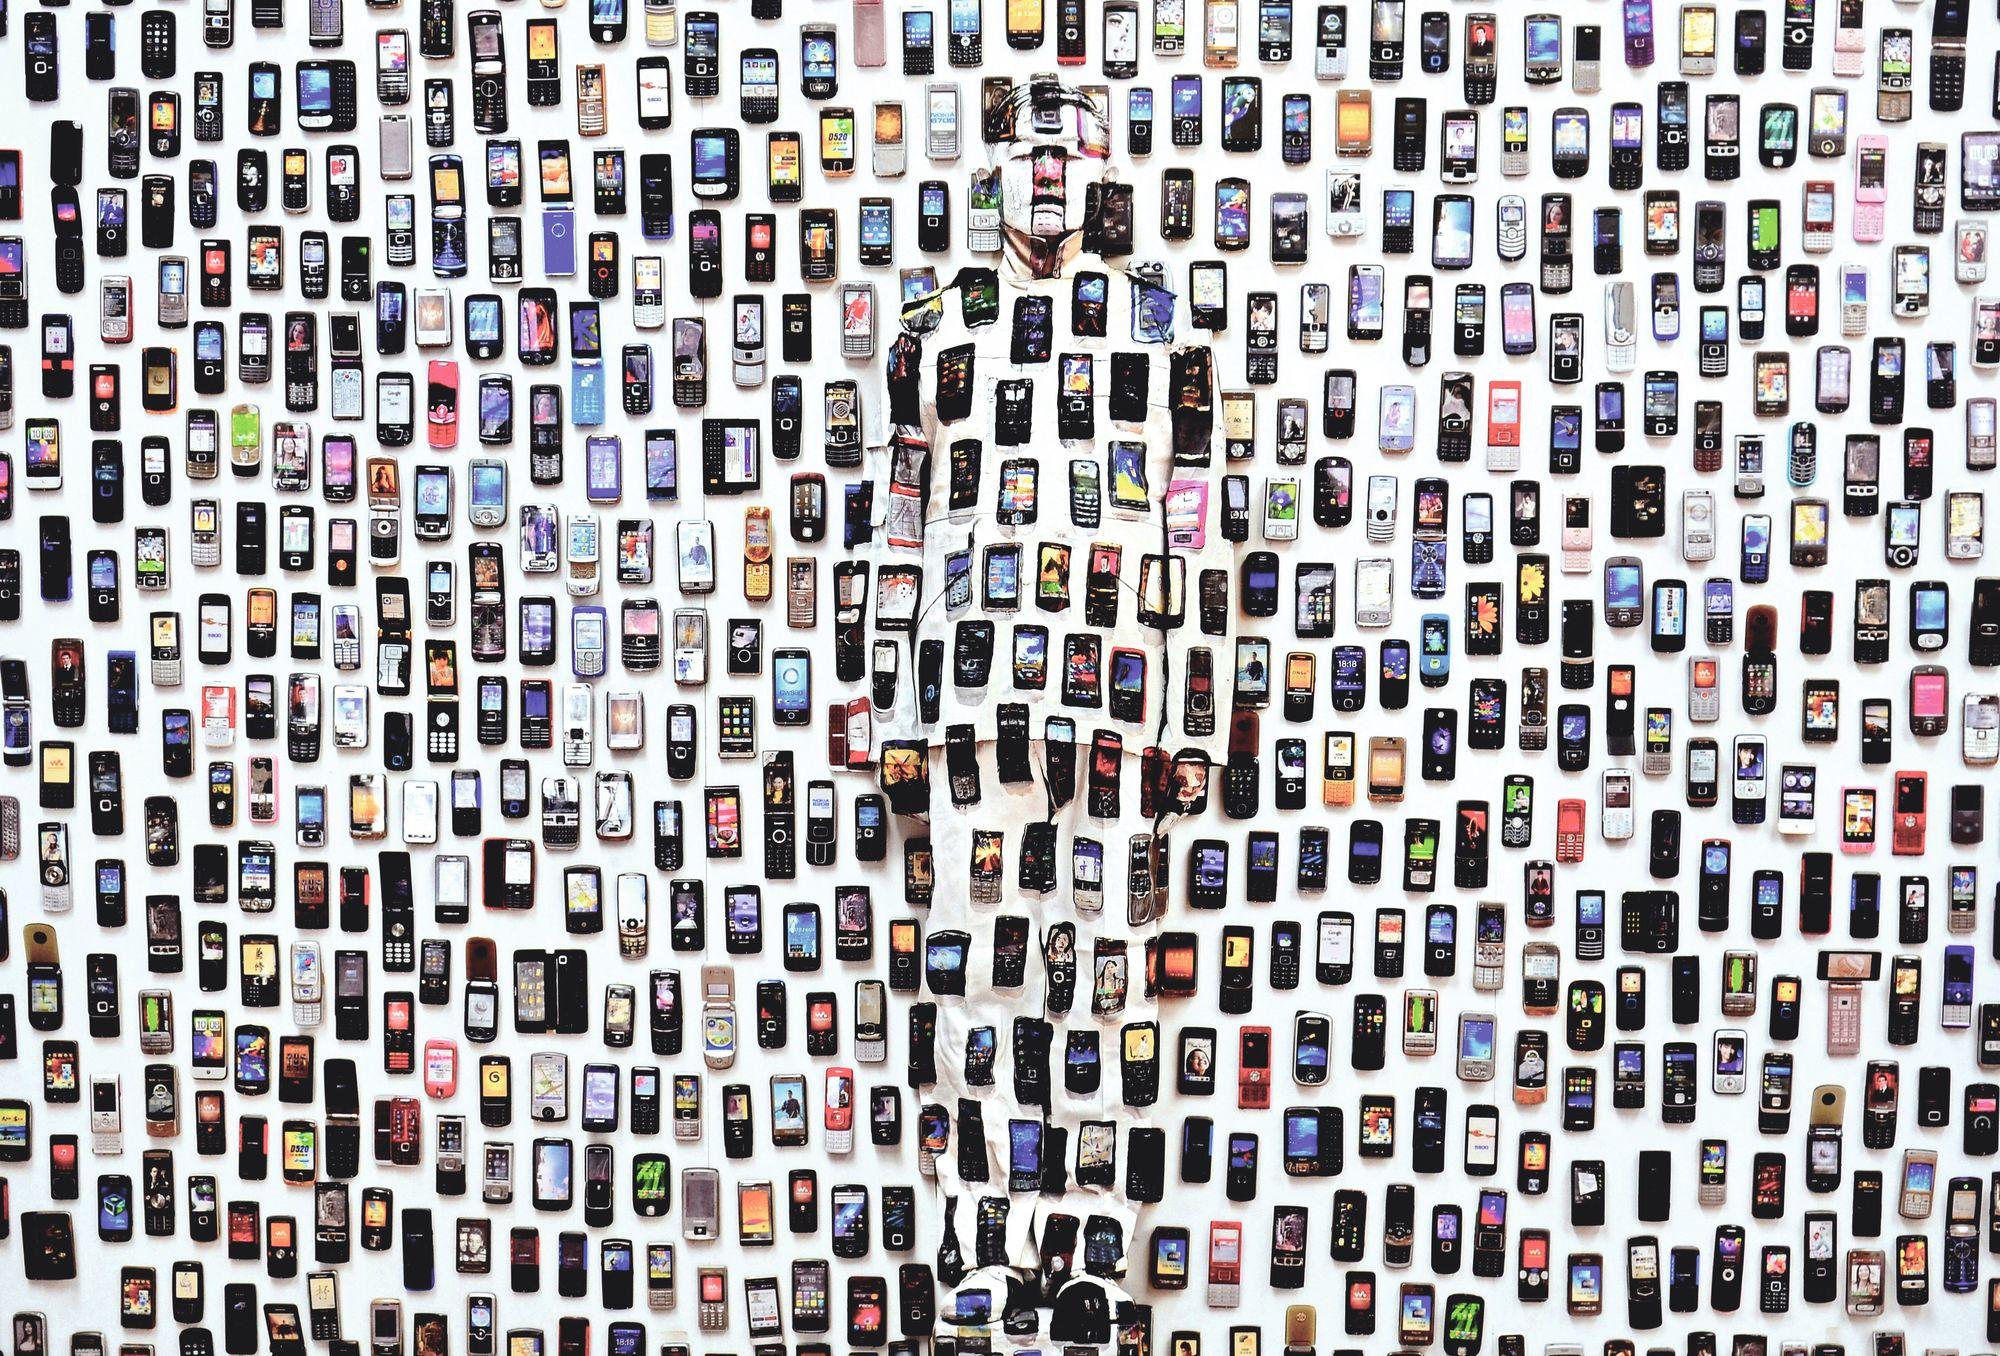 Liu Bolin, Hiding in the city 104, Mobile phone, 2012.